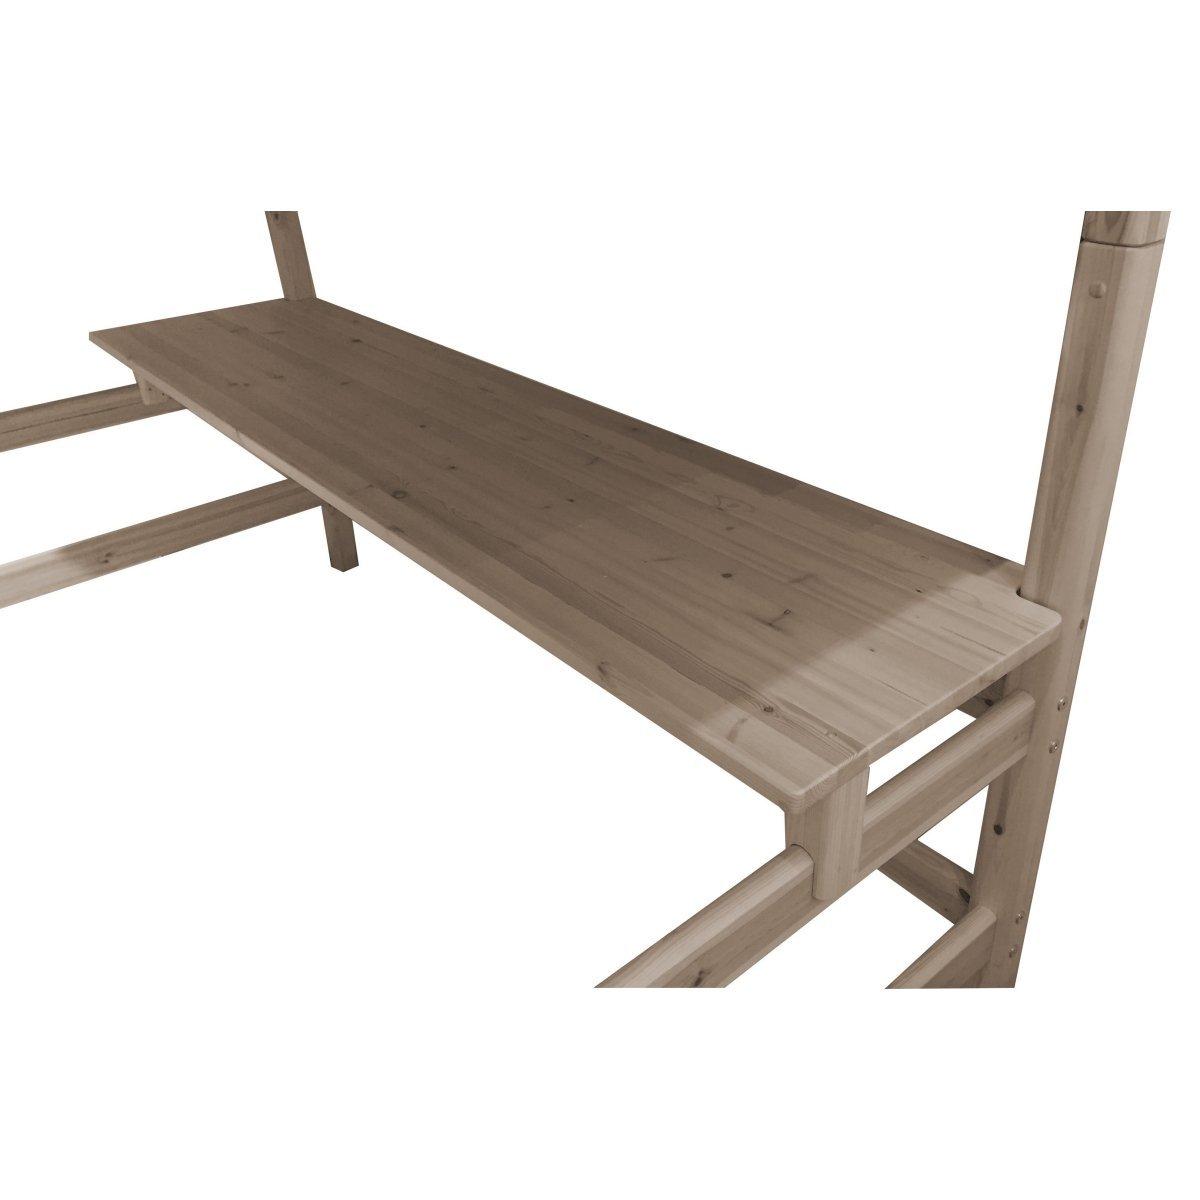 schreibtischplatte 200 hochbett terra 82 50112 11 176. Black Bedroom Furniture Sets. Home Design Ideas